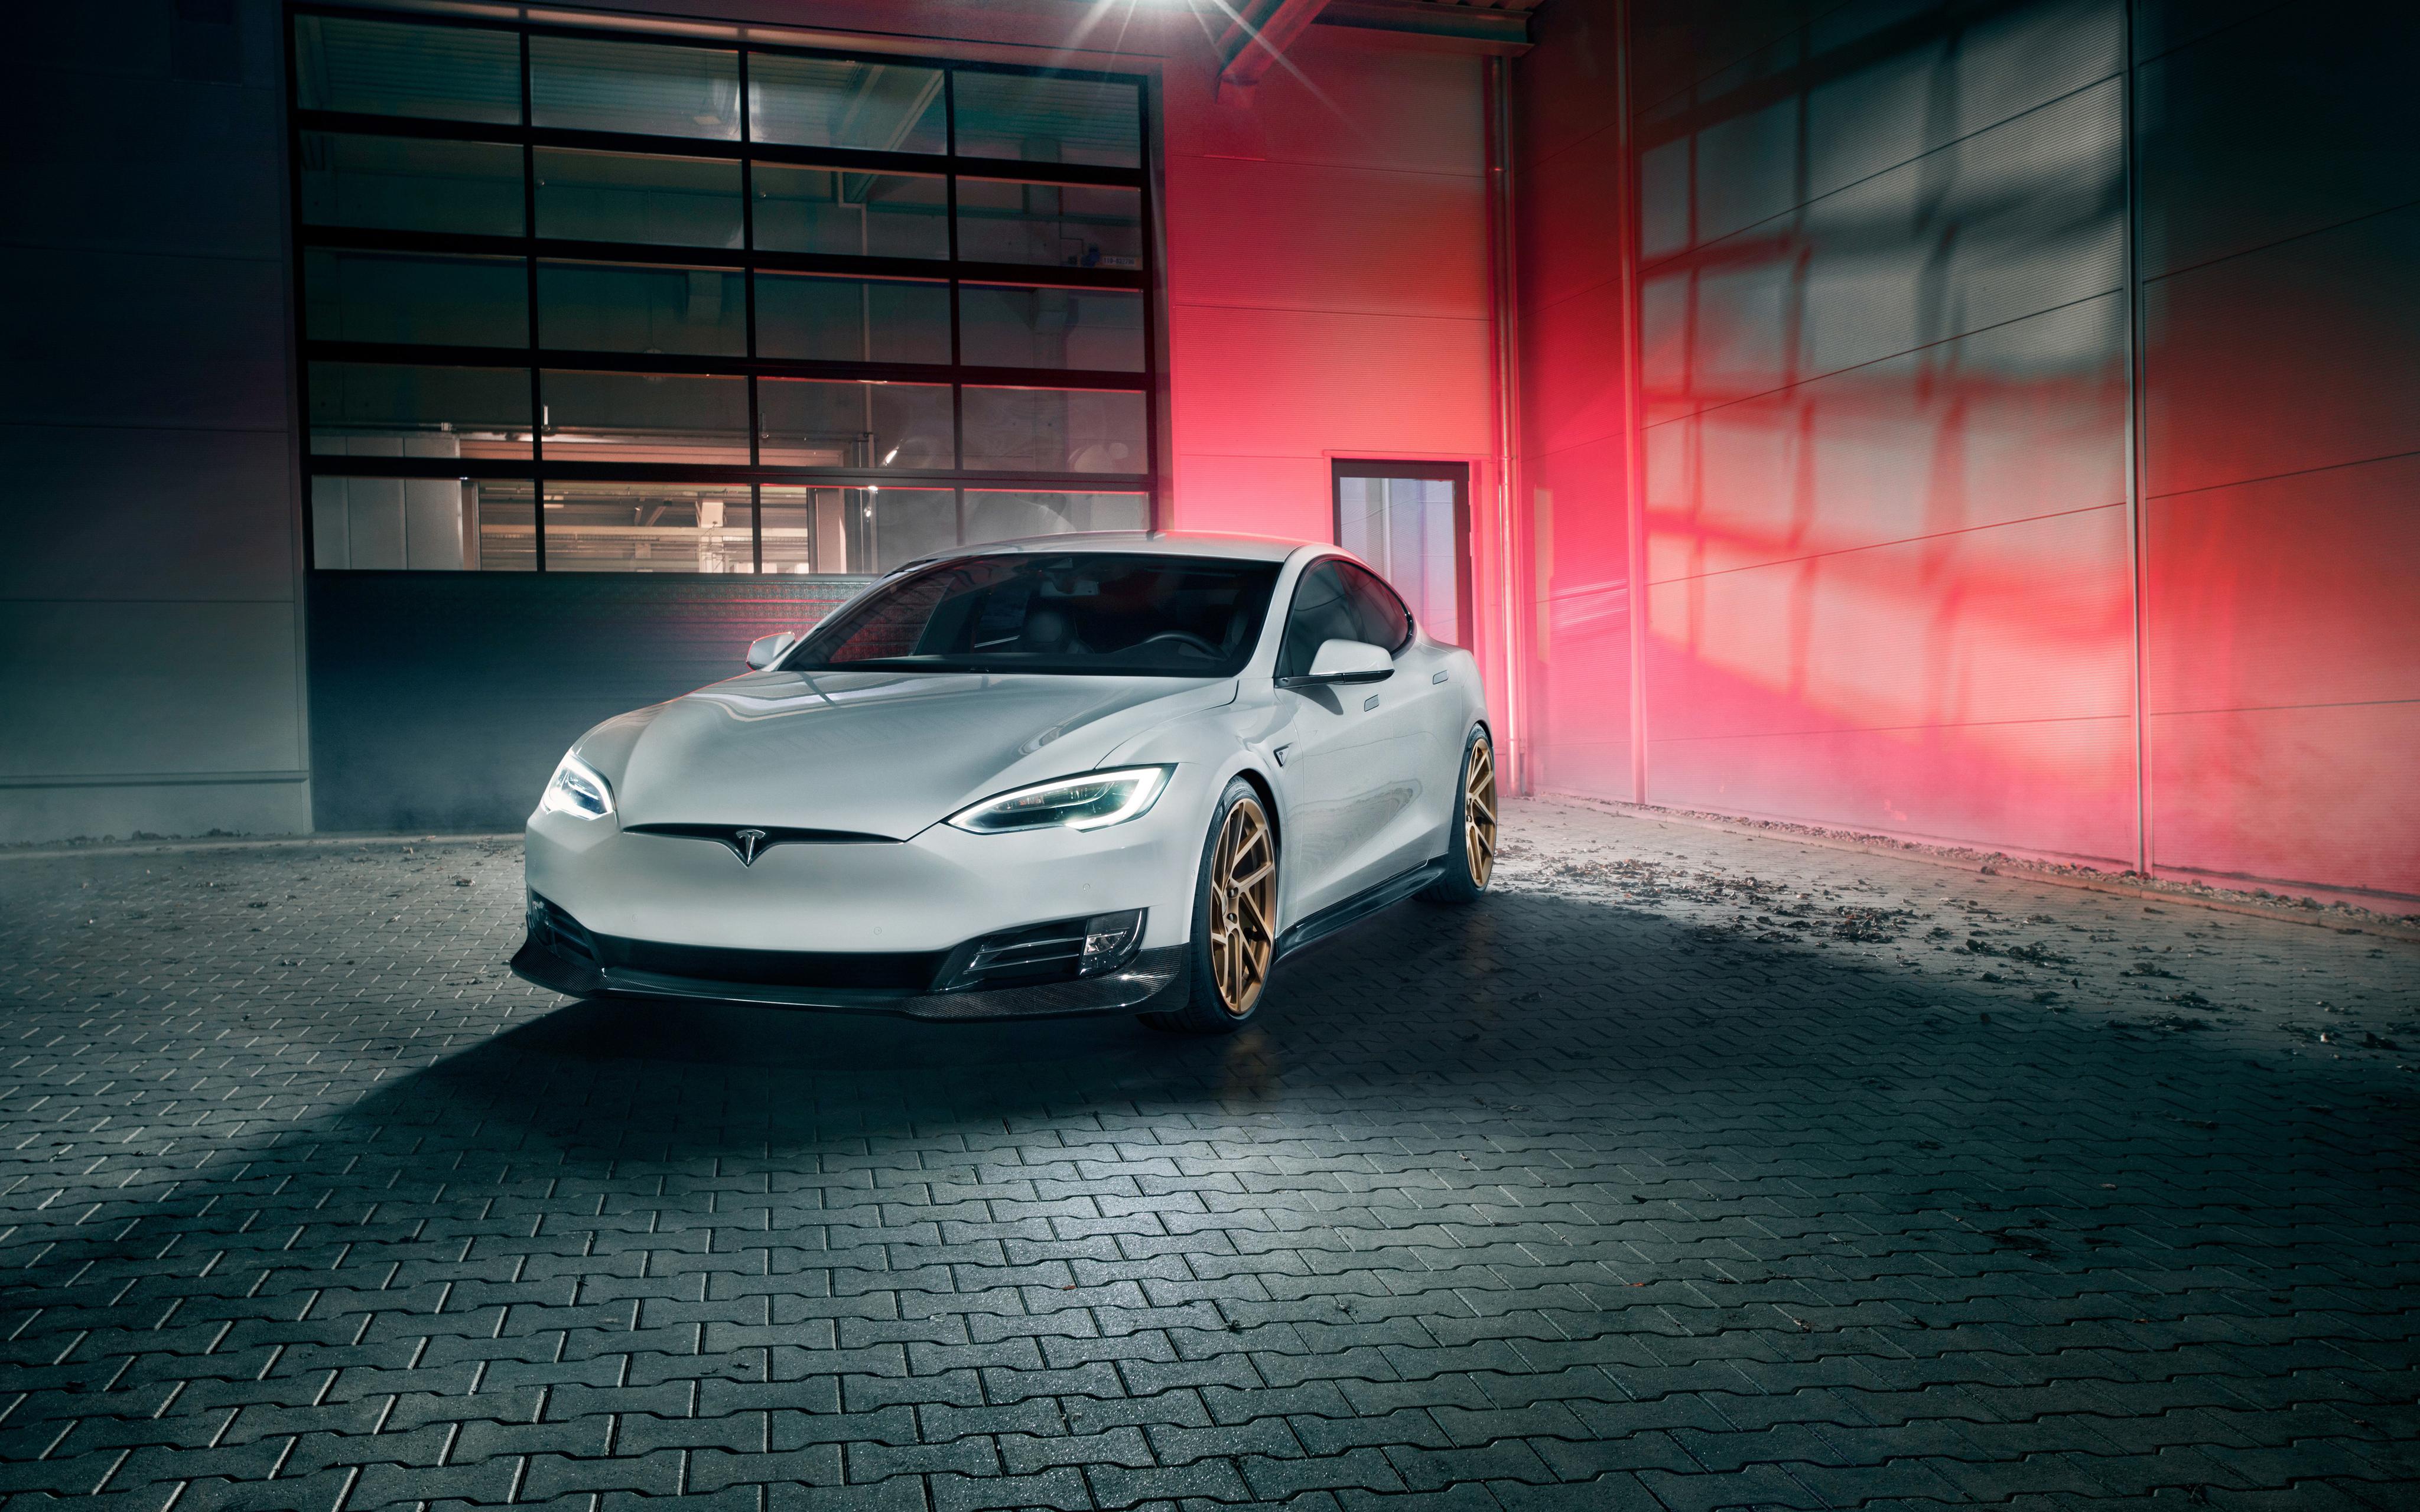 2017 Novitec Tesla Model S 4k Wallpapers Hd Wallpapers